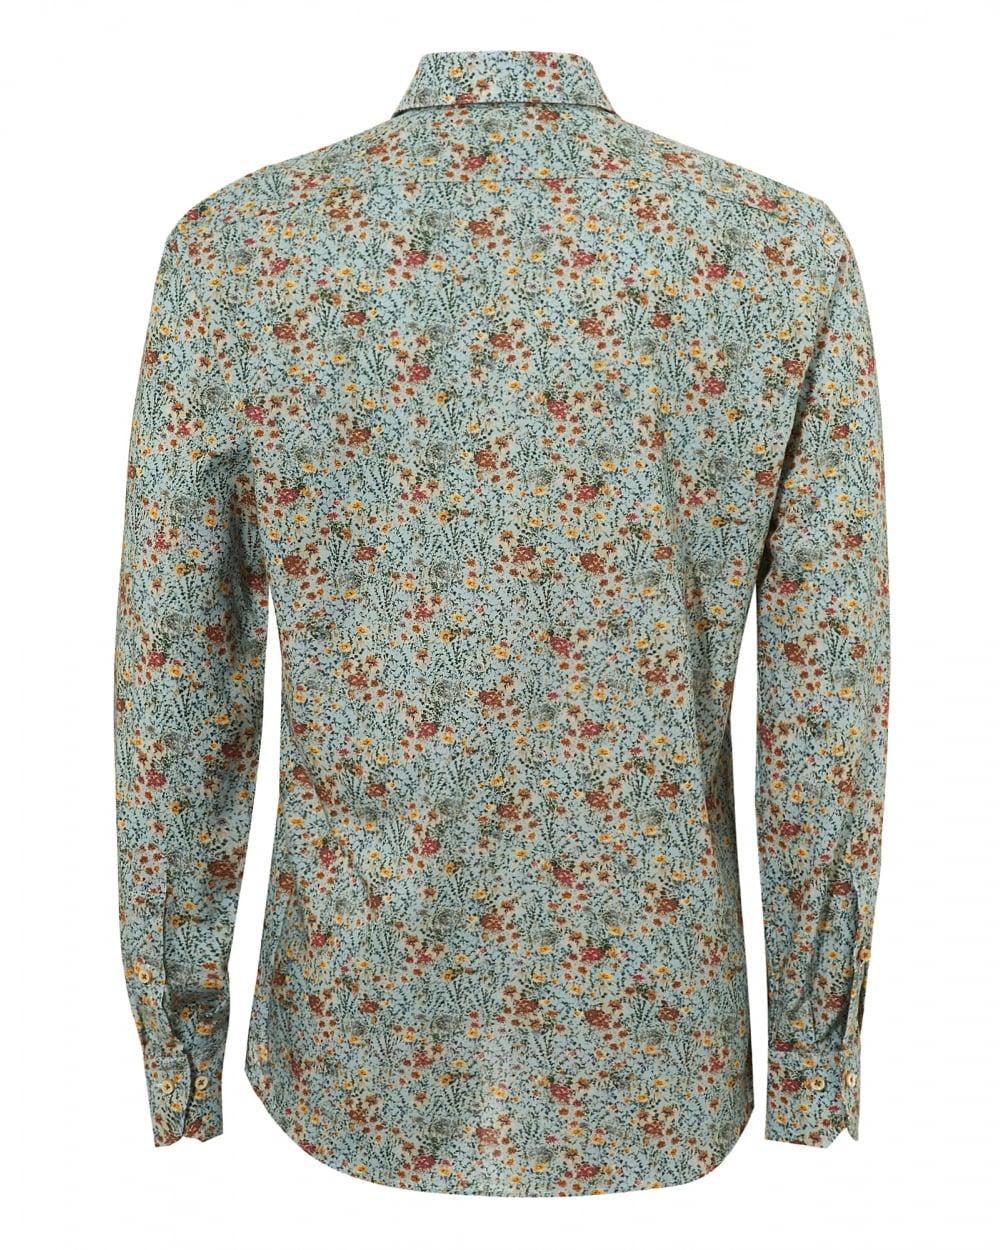 8523414f693 Stenströms Mens Liberty Floral Print Slimline Mint Green Shirt